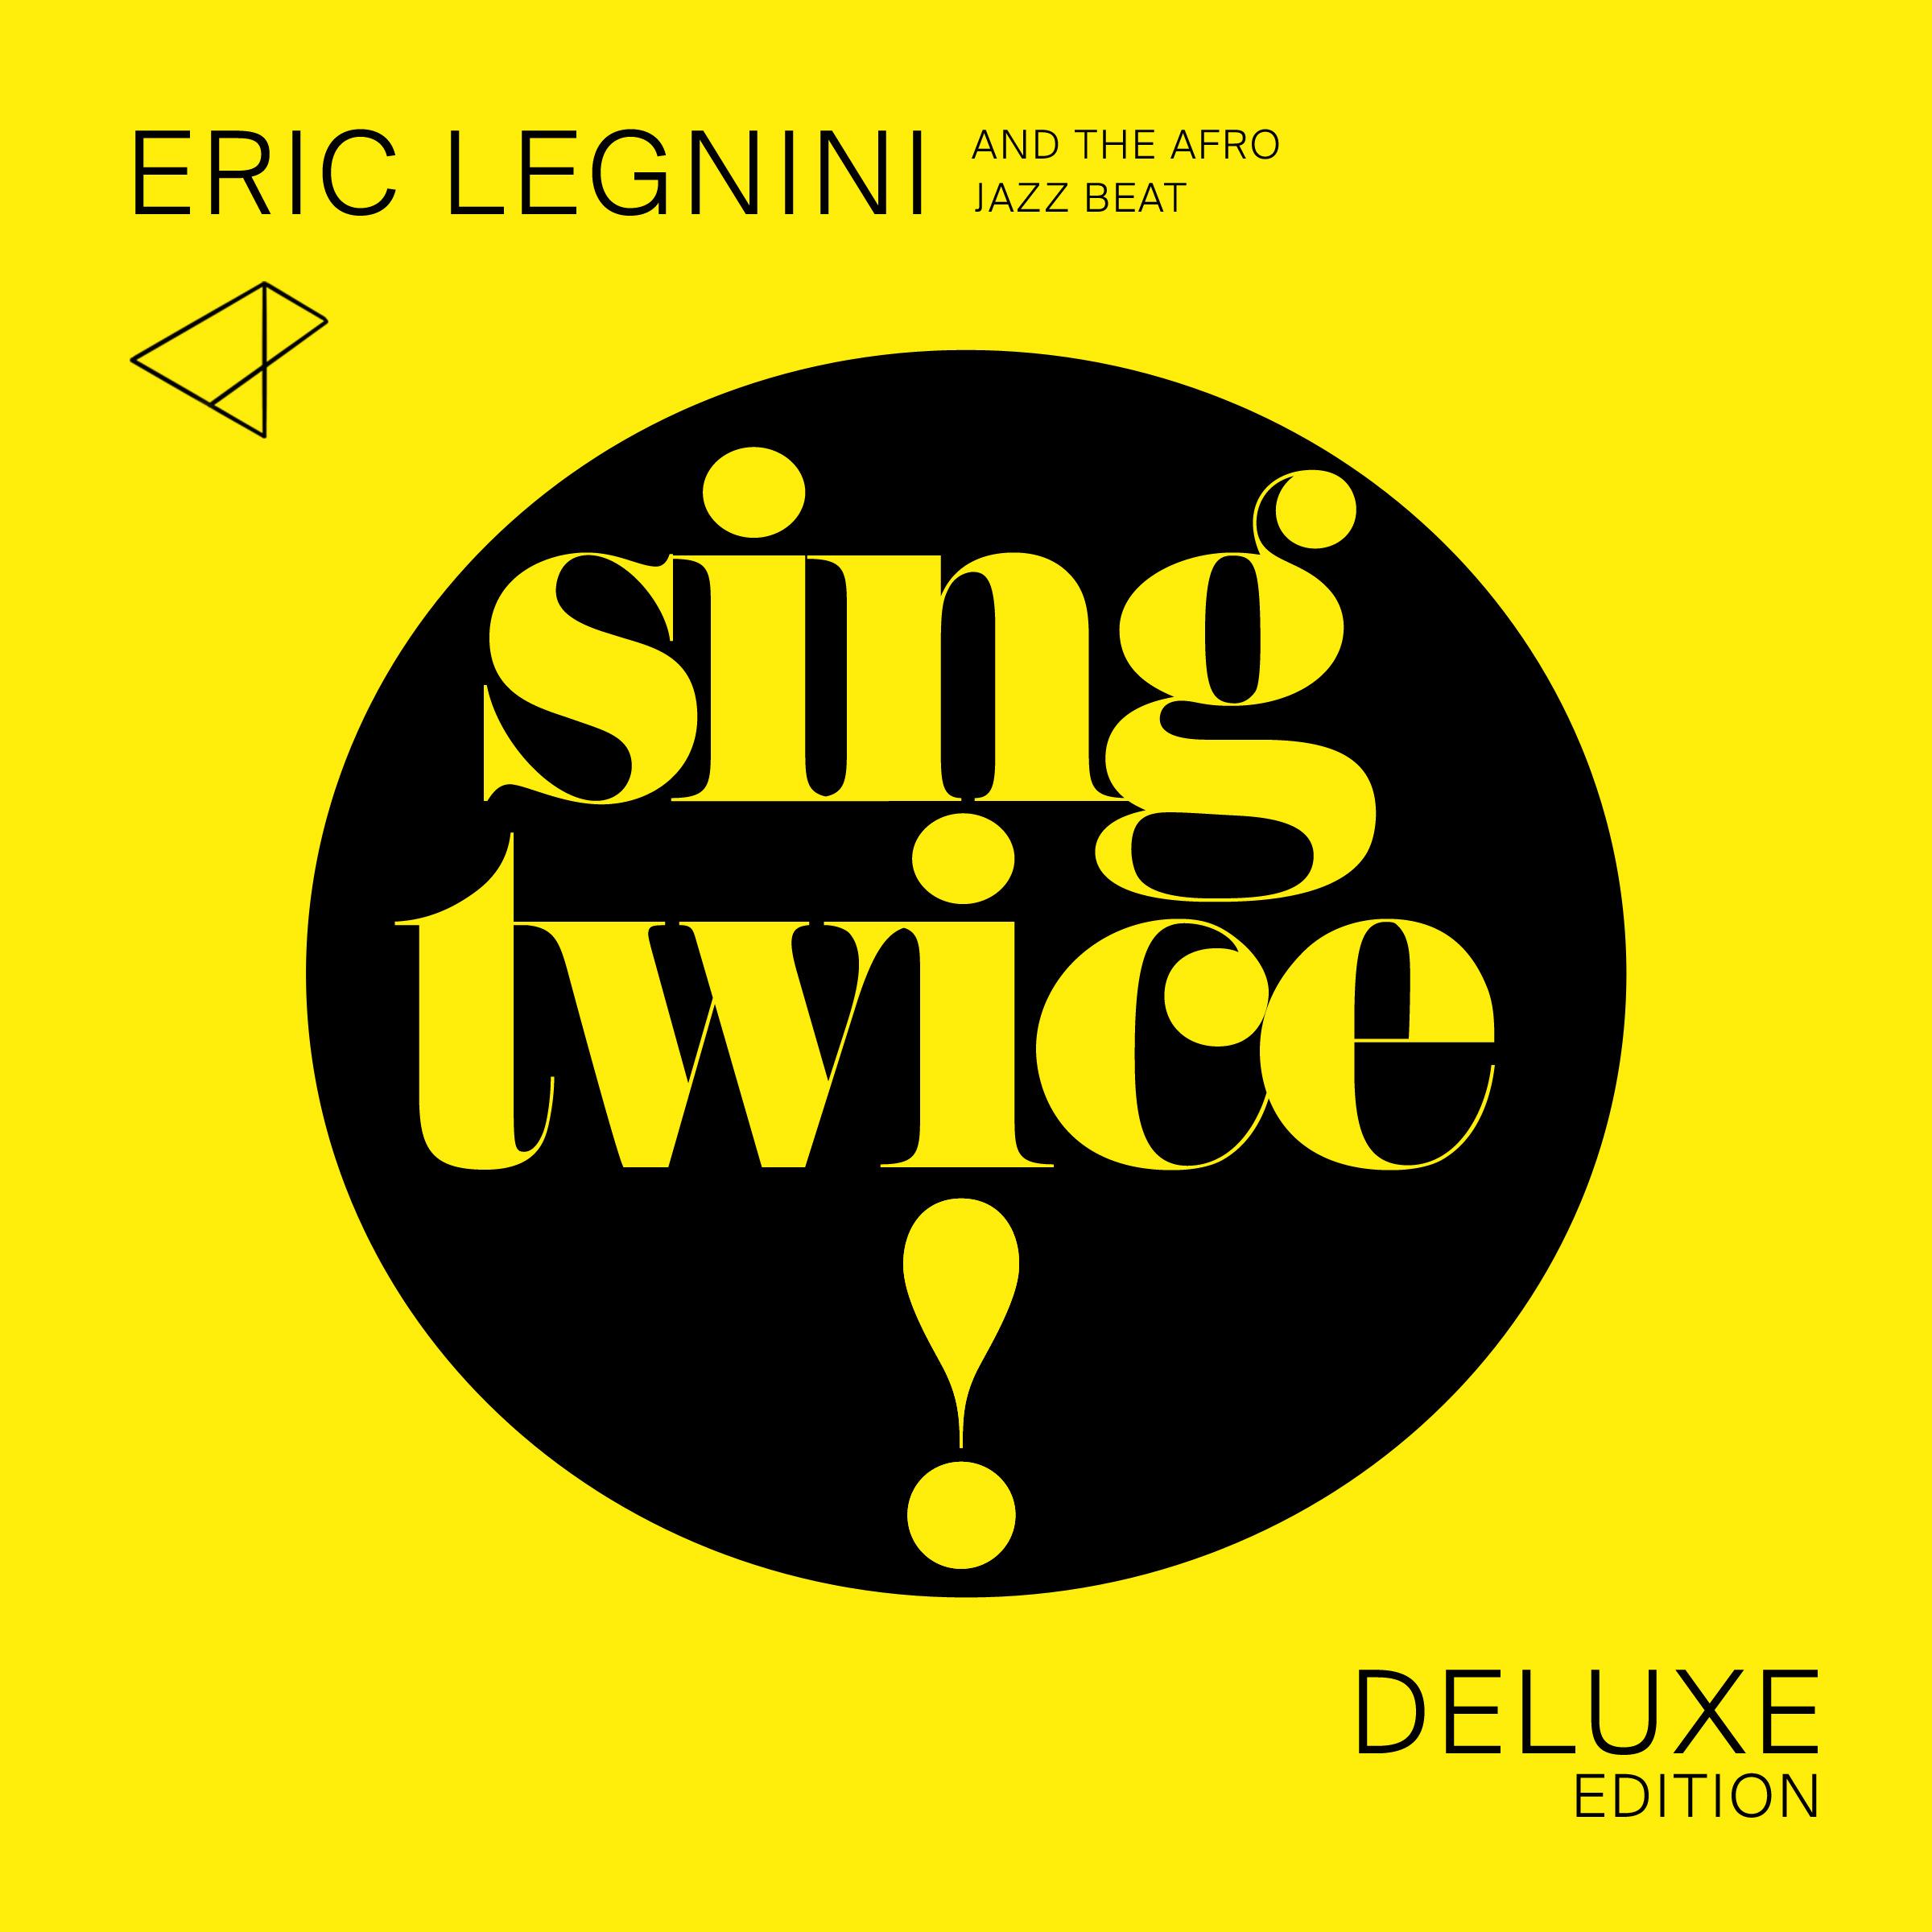 1e5ea9b0b69 Eric Legnini And The Afro Jazz Beat Swing Twice! (Discograph